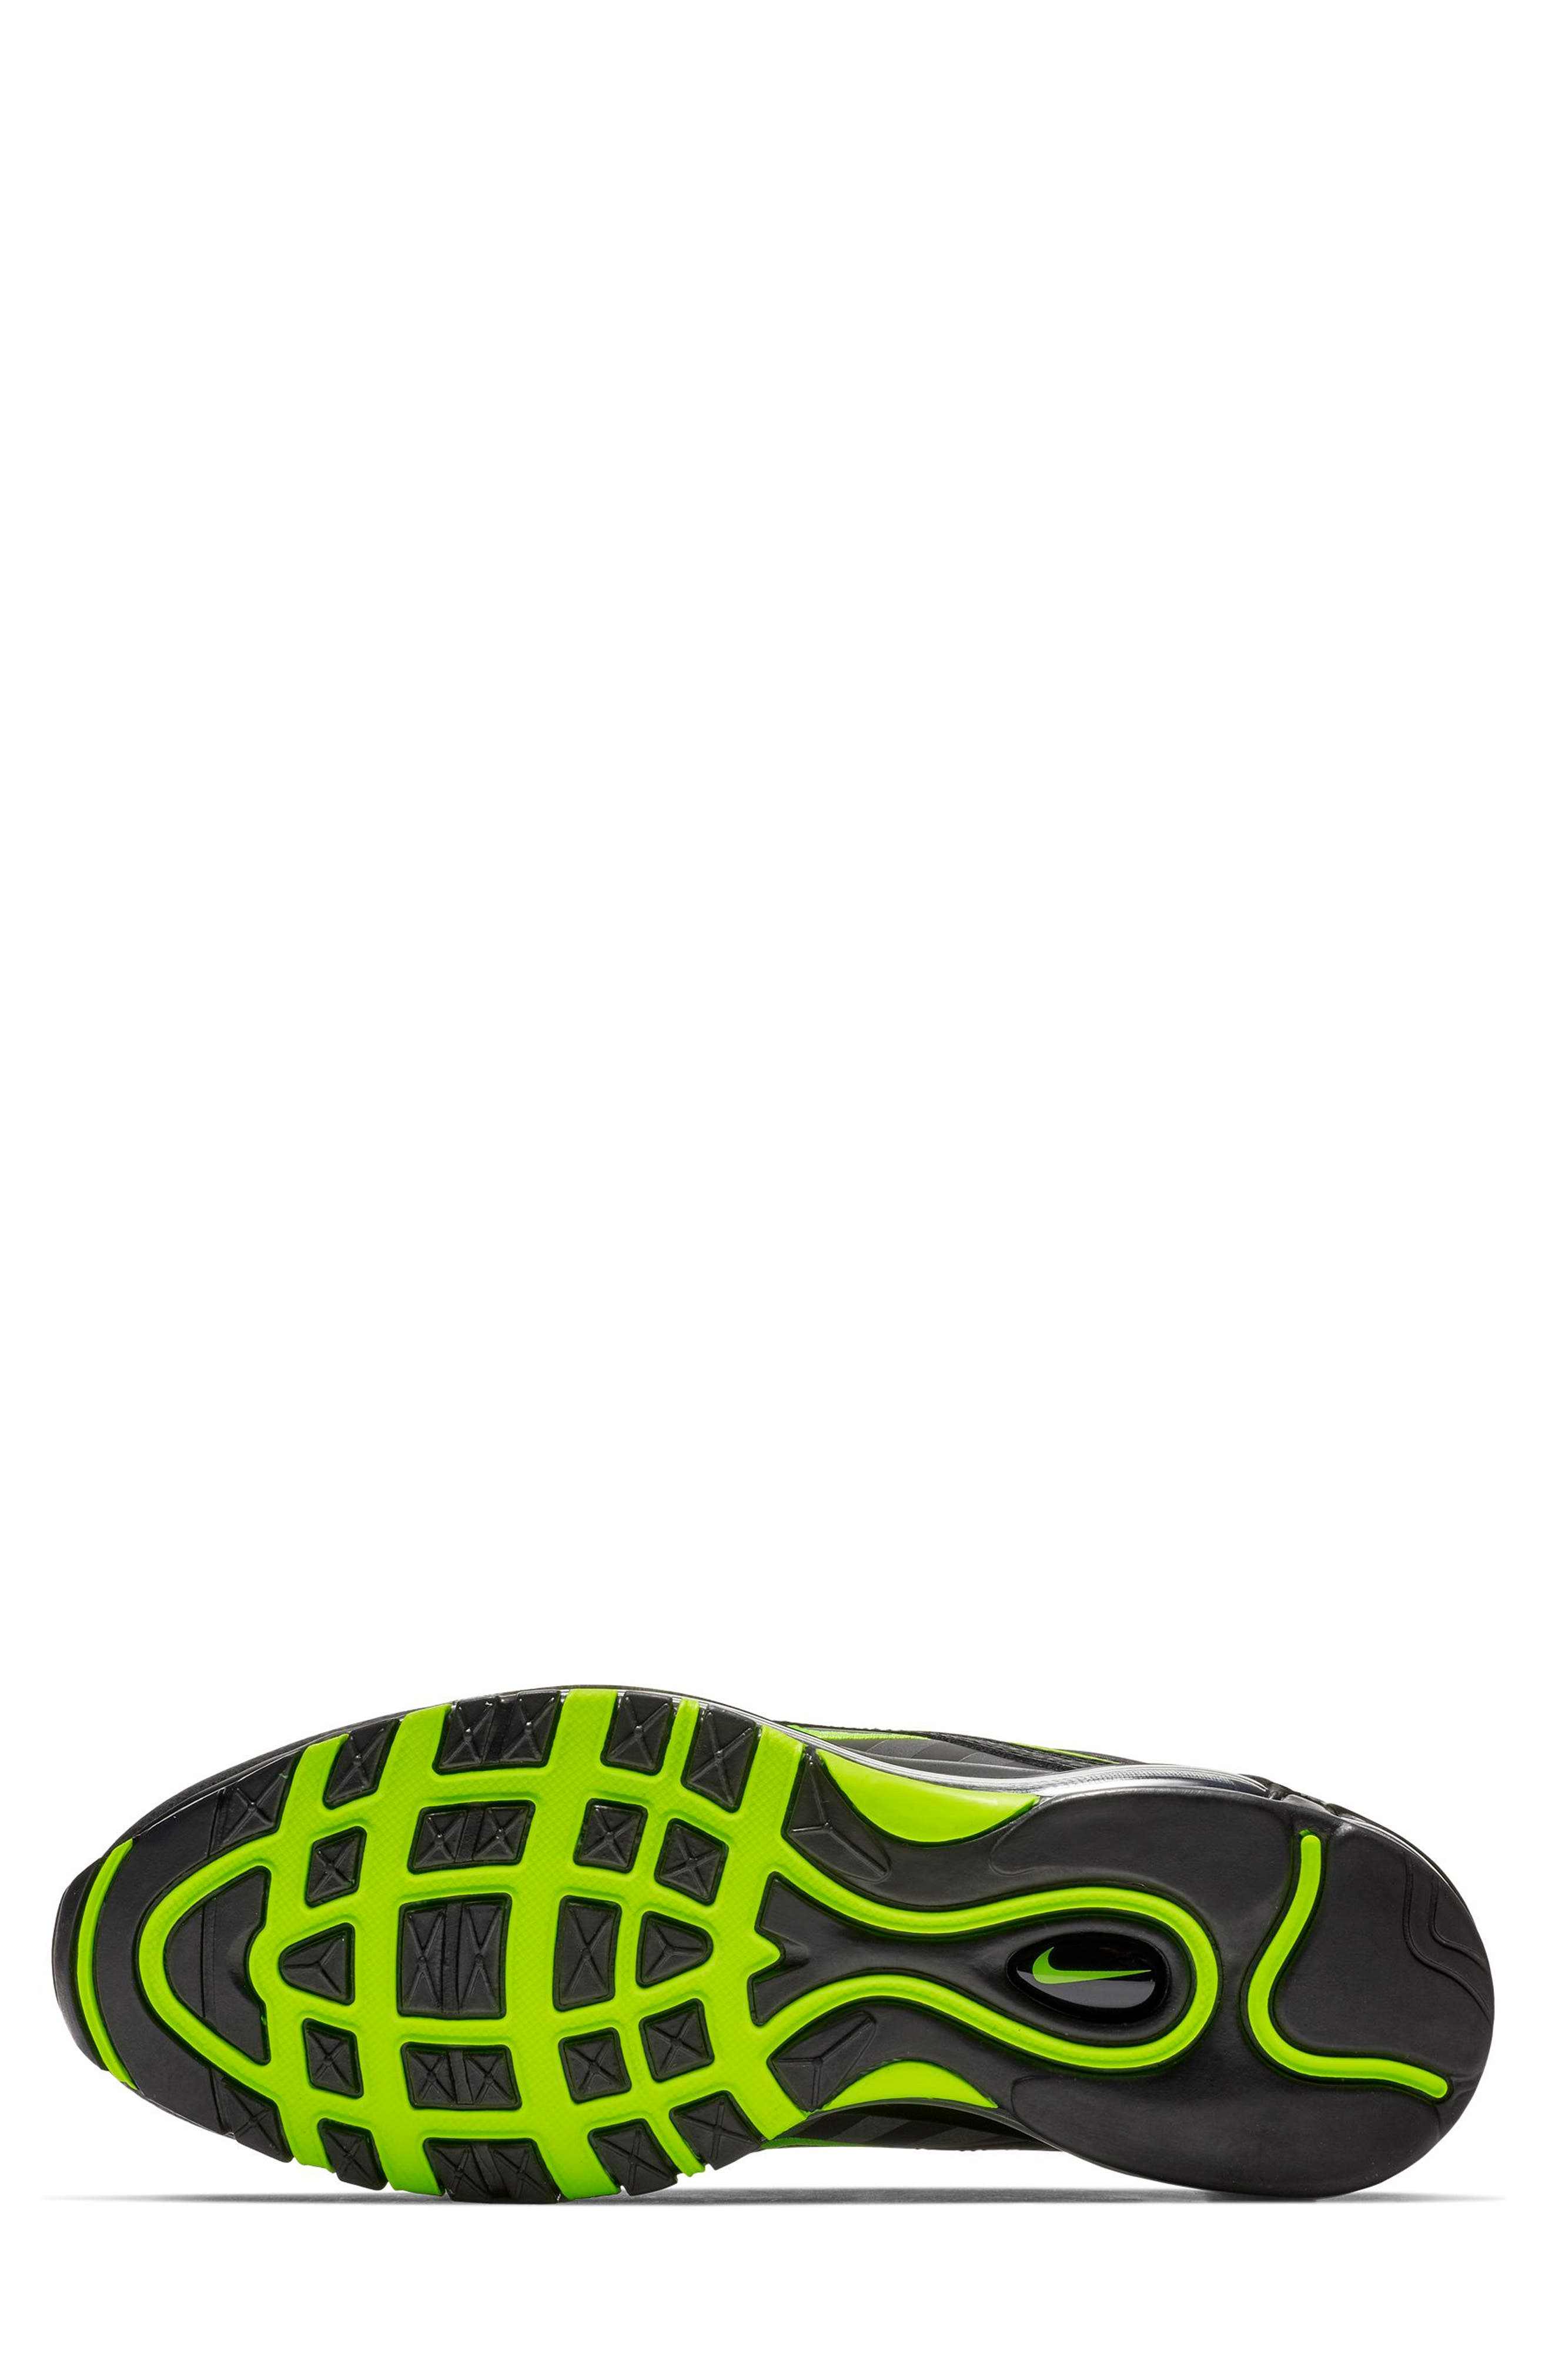 Air Max 97 Sneaker,                             Alternate thumbnail 5, color,                             THUNDER GREY/ LIME/ BLACK